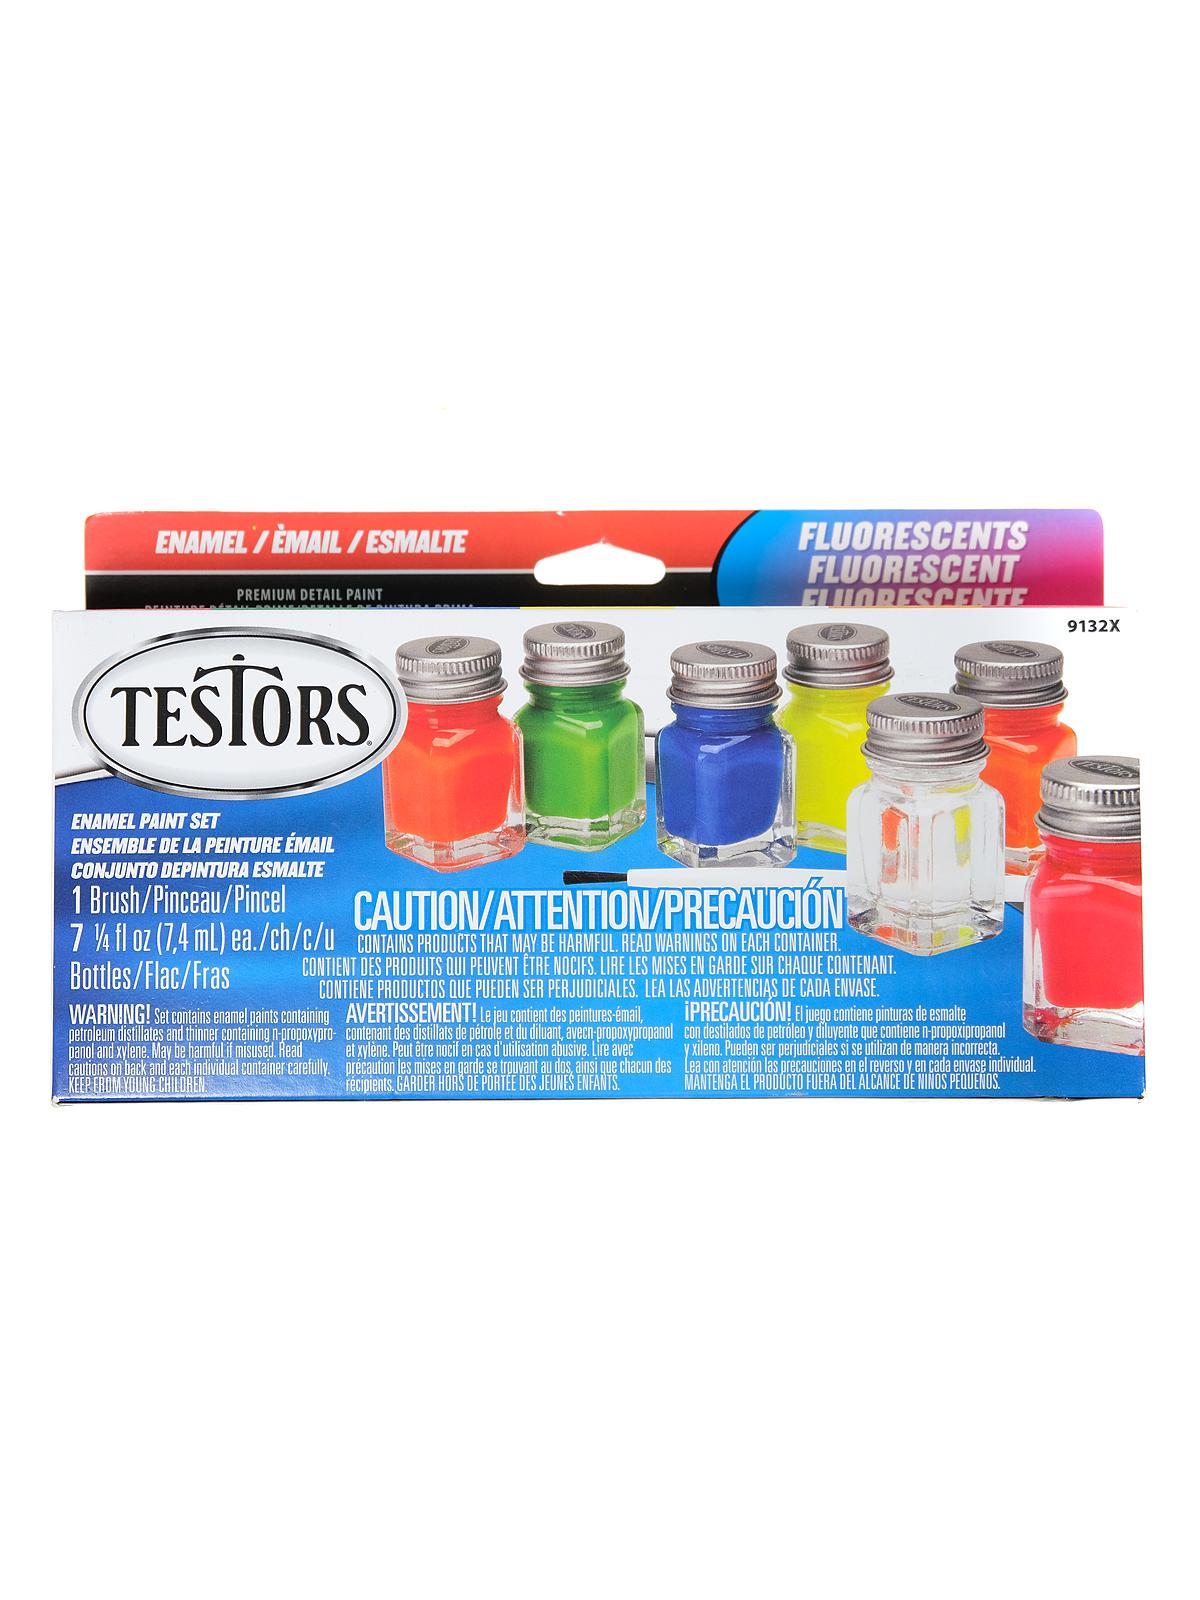 Testors - Ultra Bright Fluorescent Paint Kit